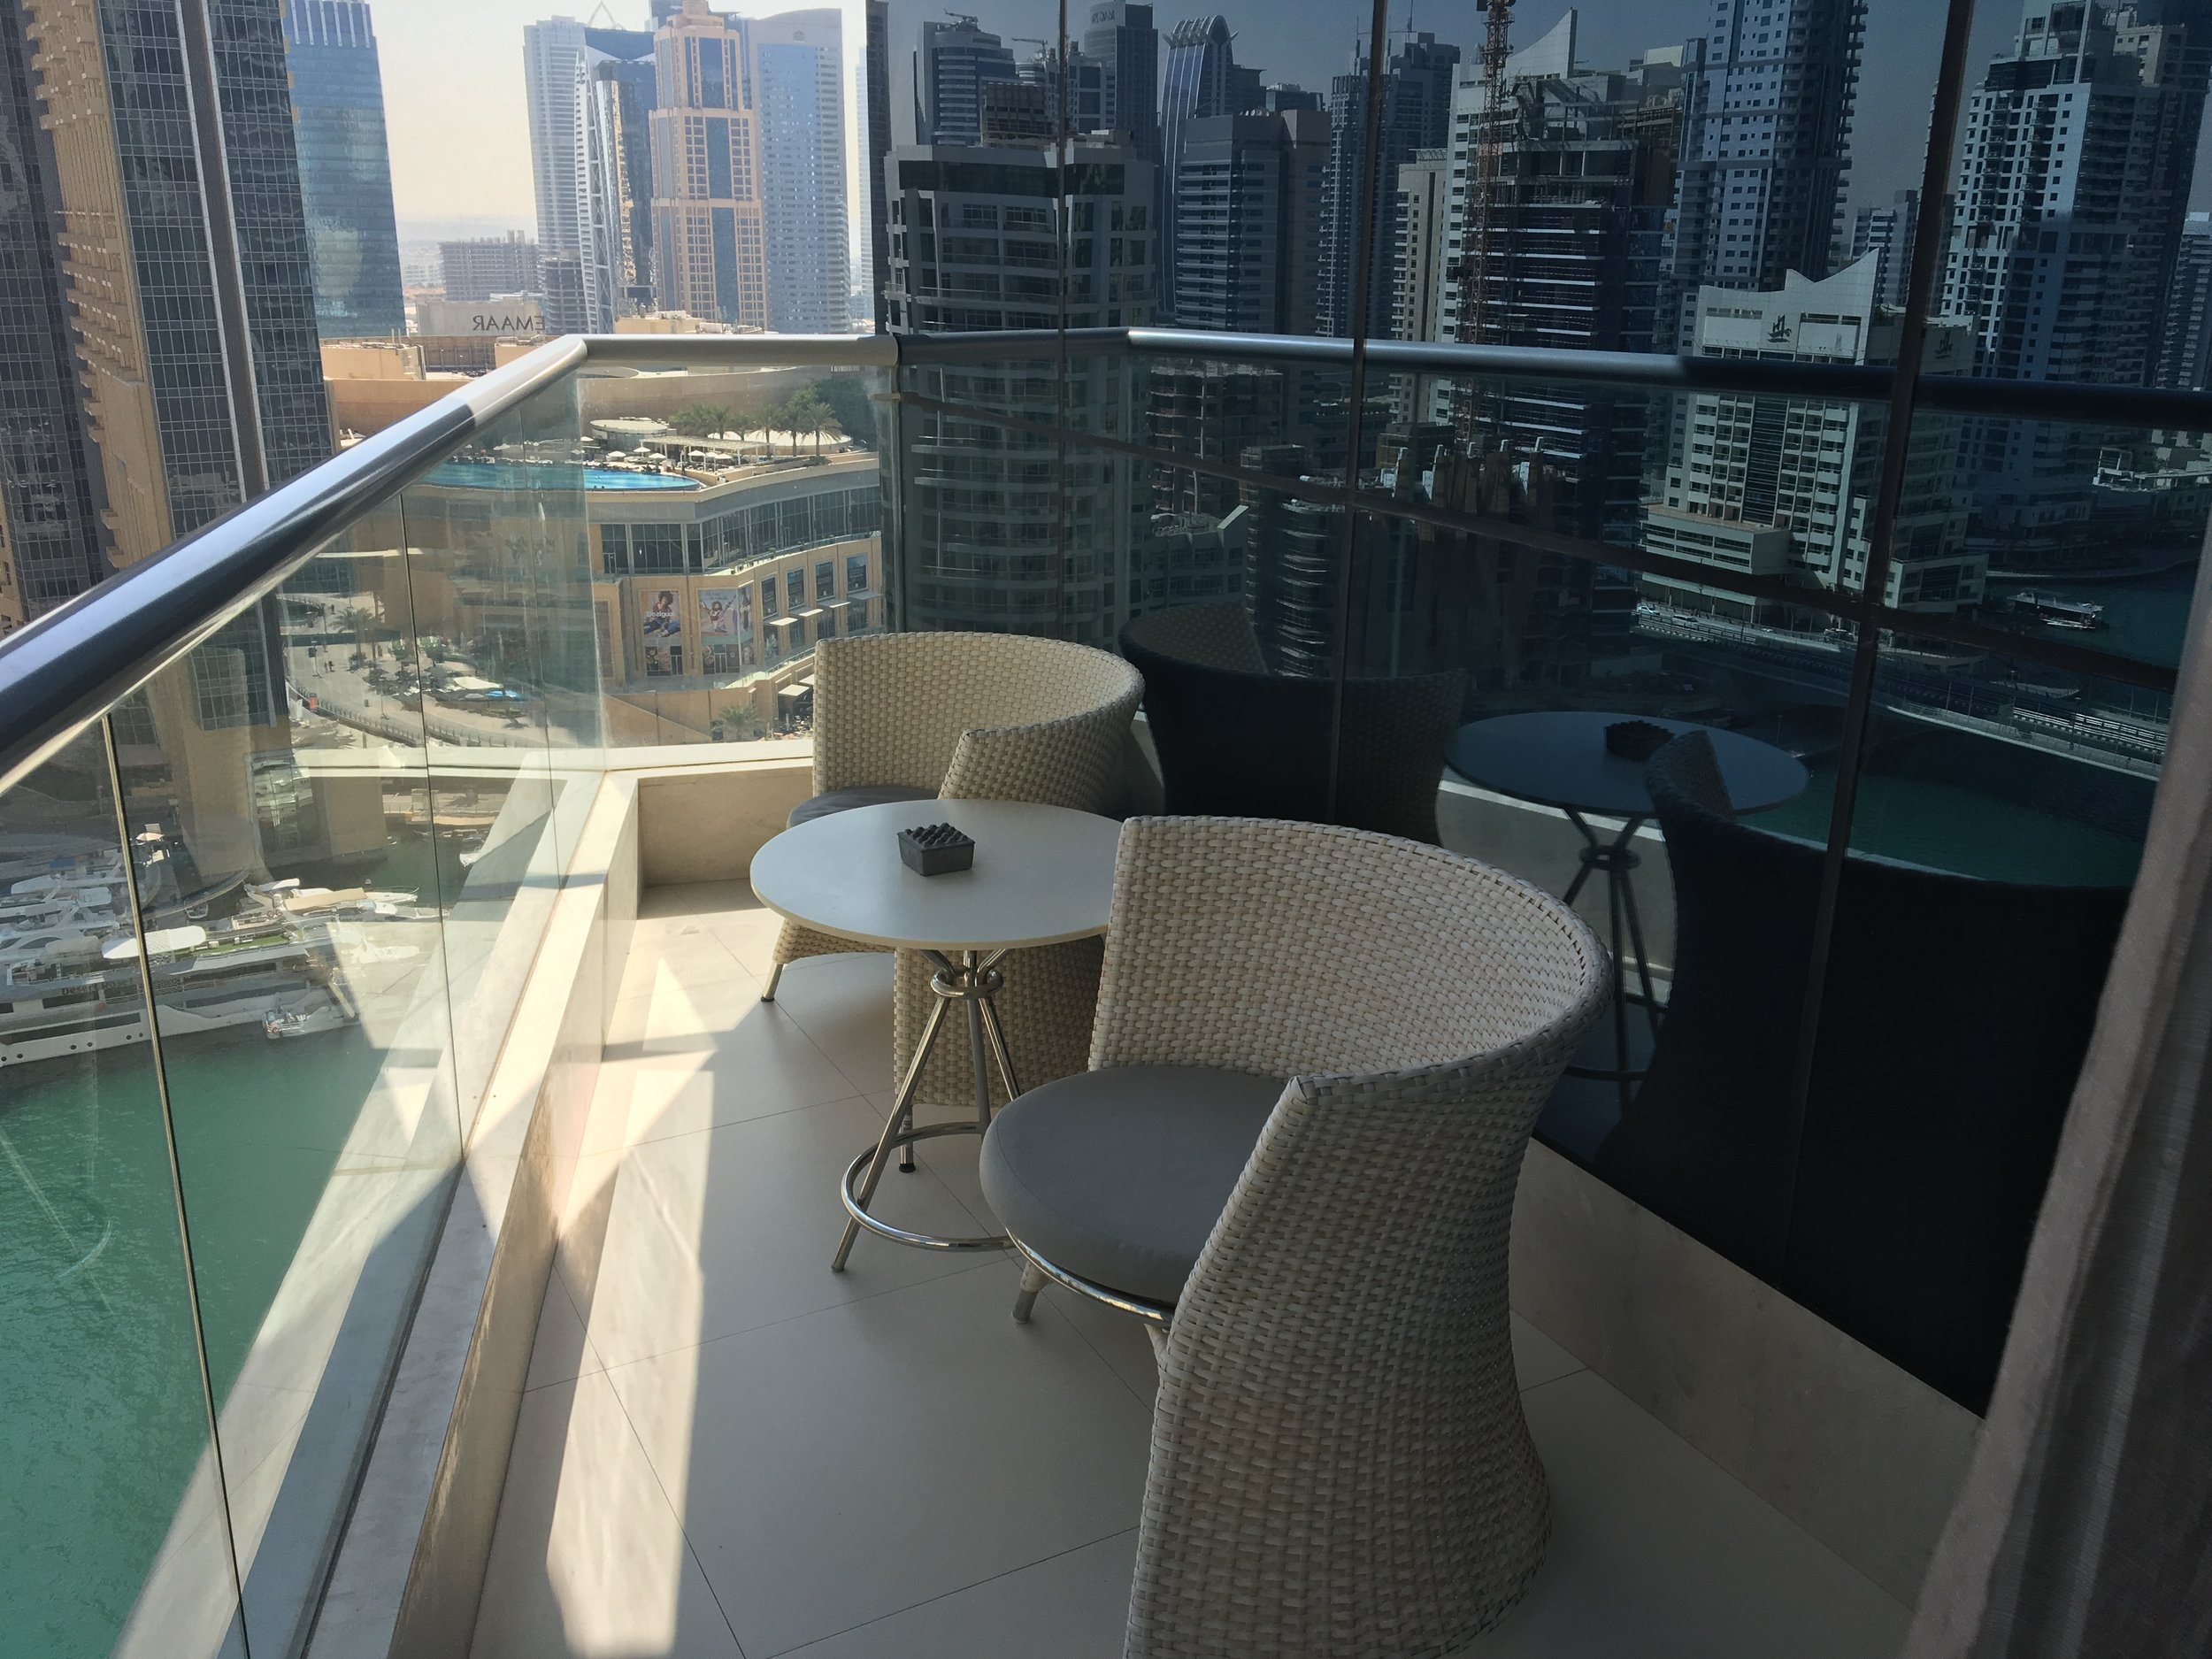 Intercontinental dubai marina 'Studio Marina View' Room